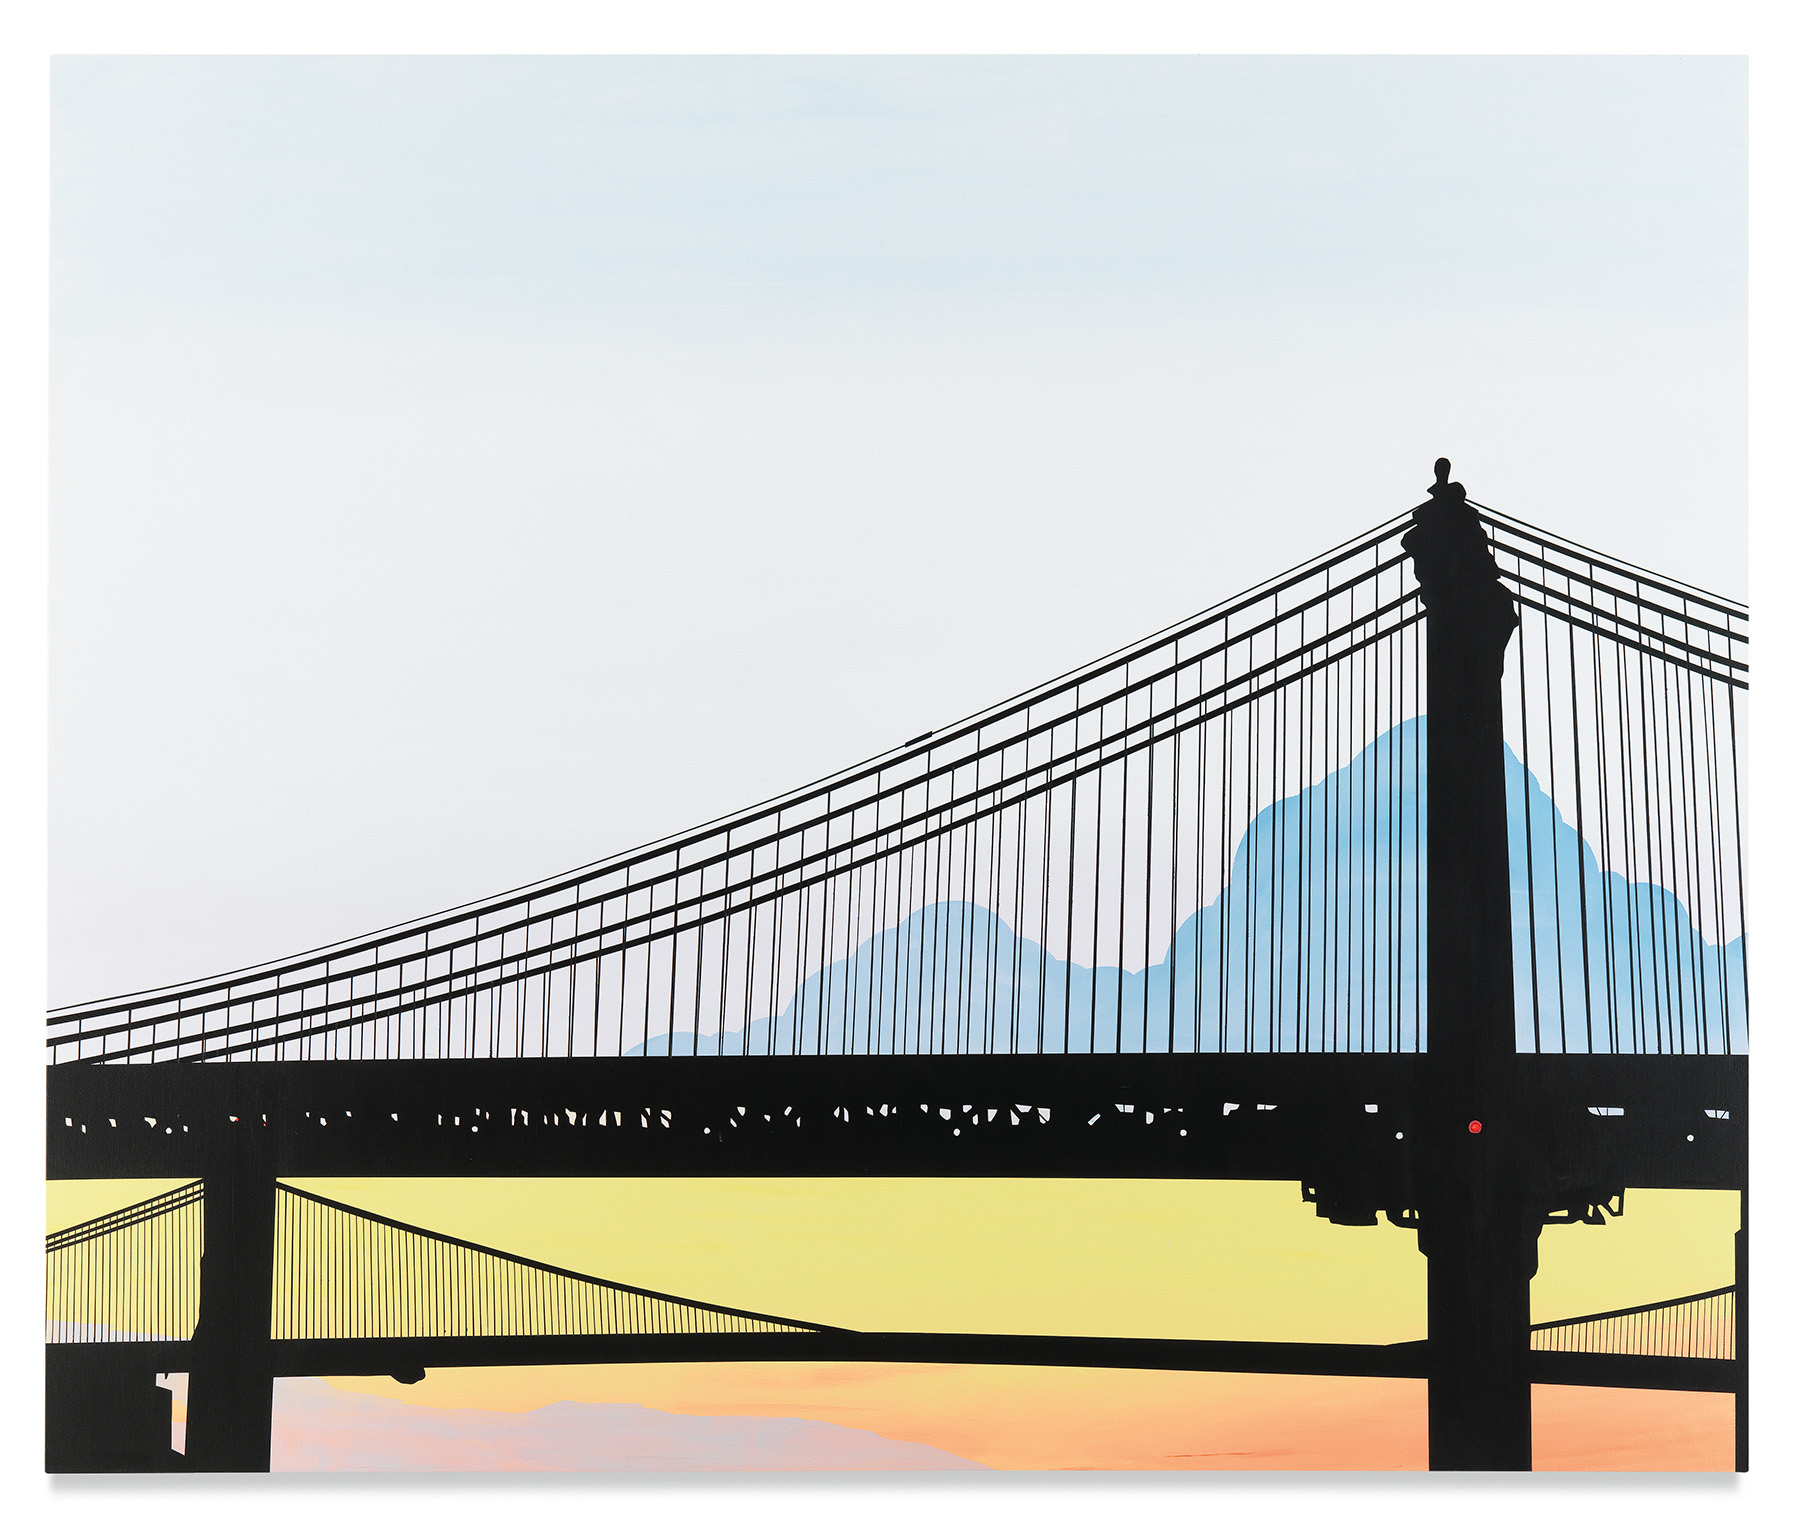 BA Two Bridges.31266.jpg